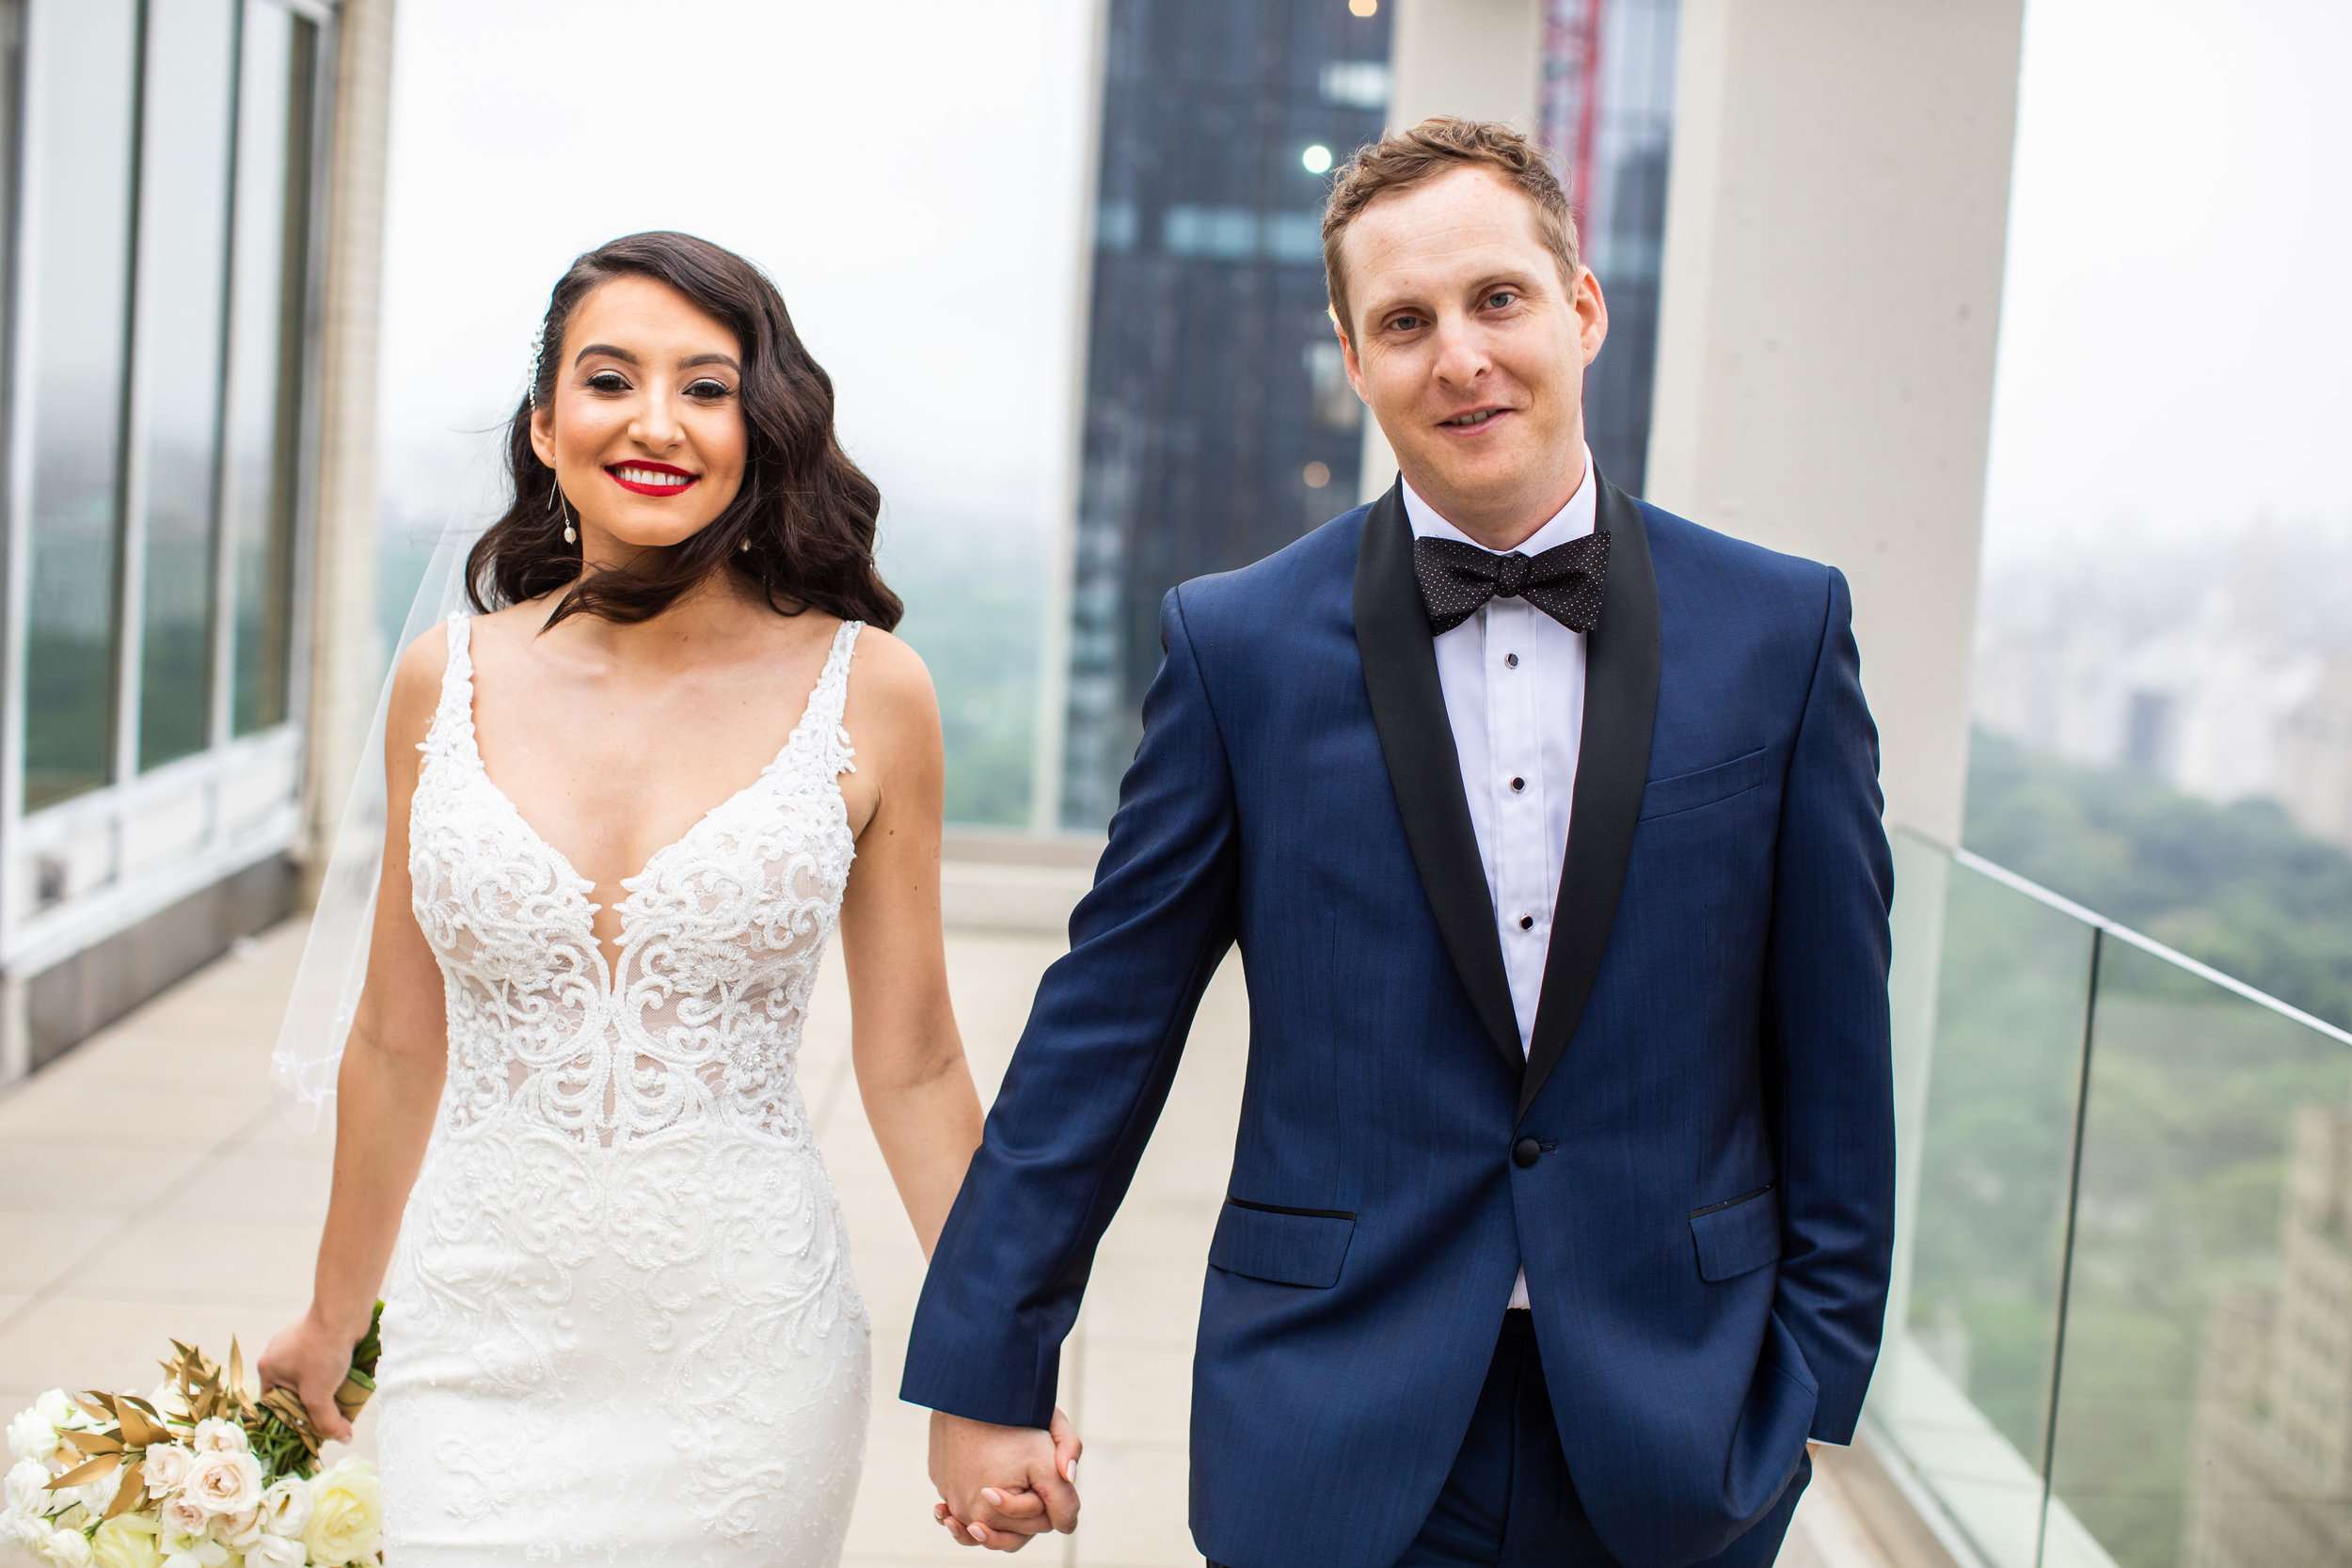 Alex-Edge-DJ-Wedding-Entertainment-Parker-New-York_1.JPG